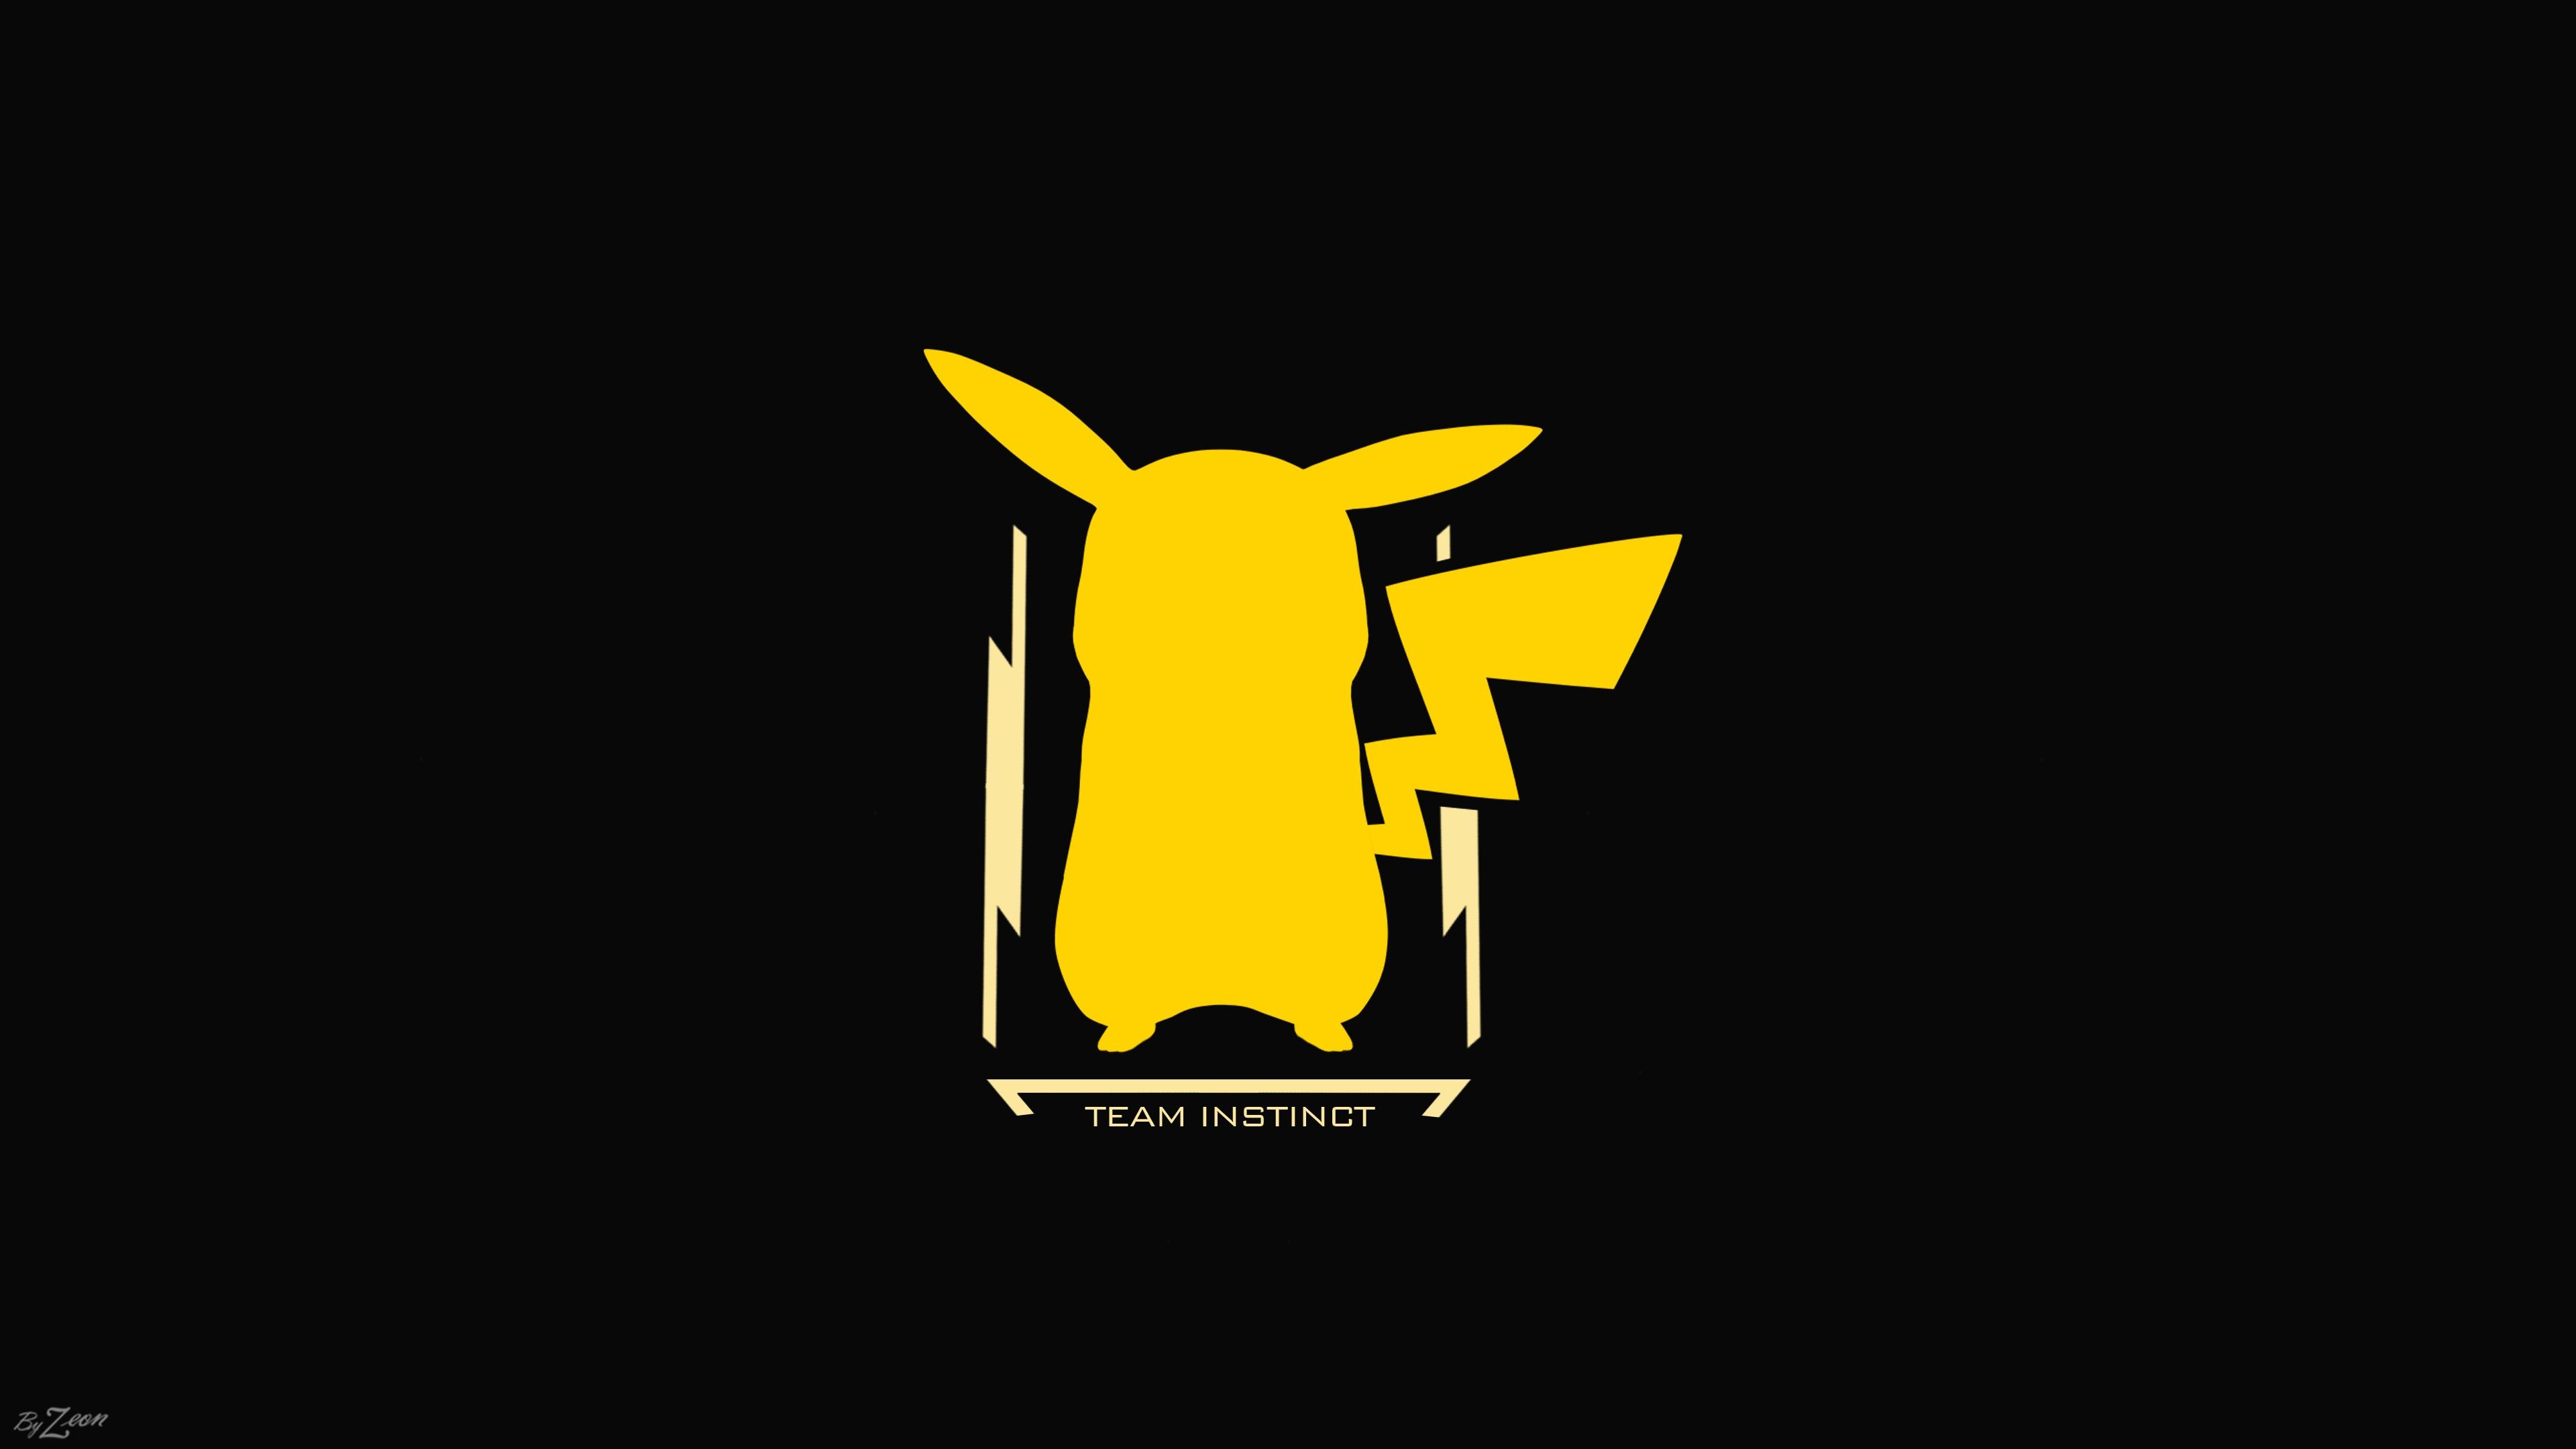 Pokemon Go Wallpaper Pokemon Go Wallpaper With Pokemon Go